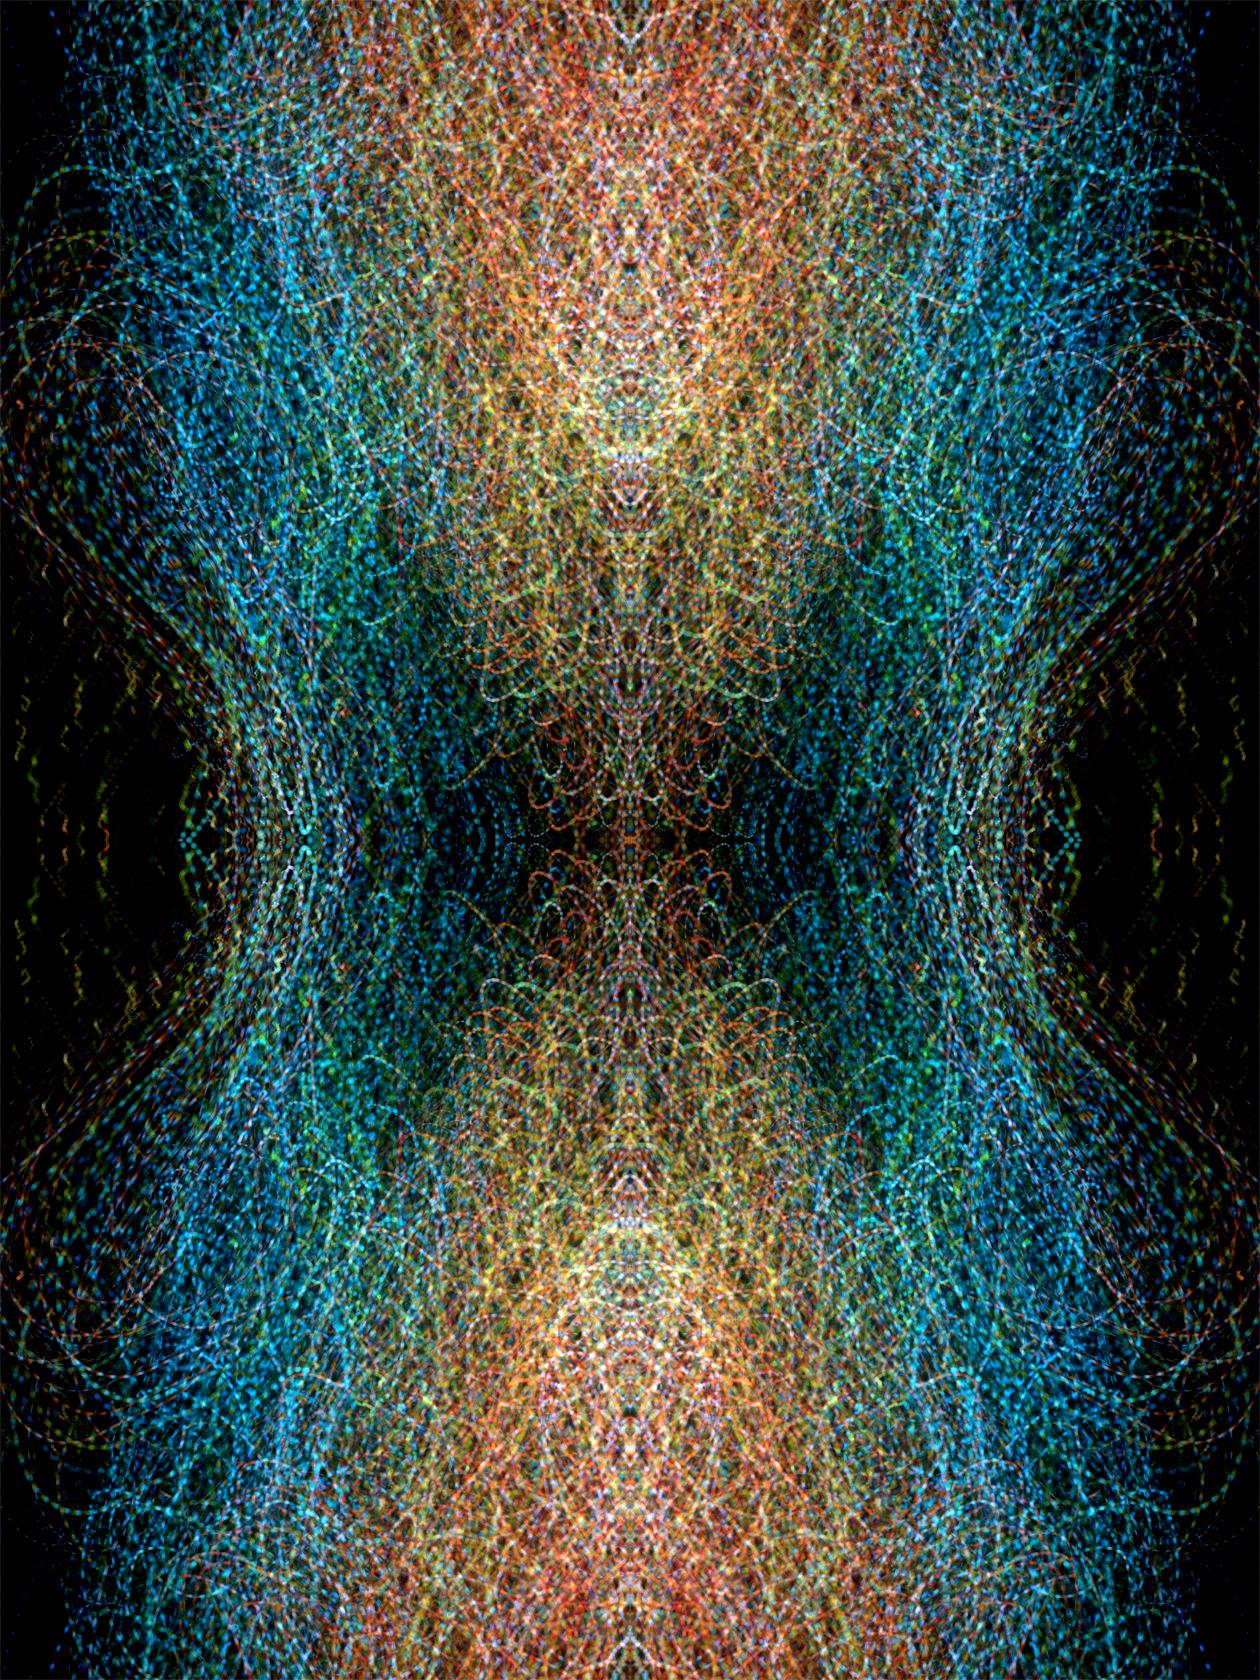 merged_0950.2 copy 3.jpeg